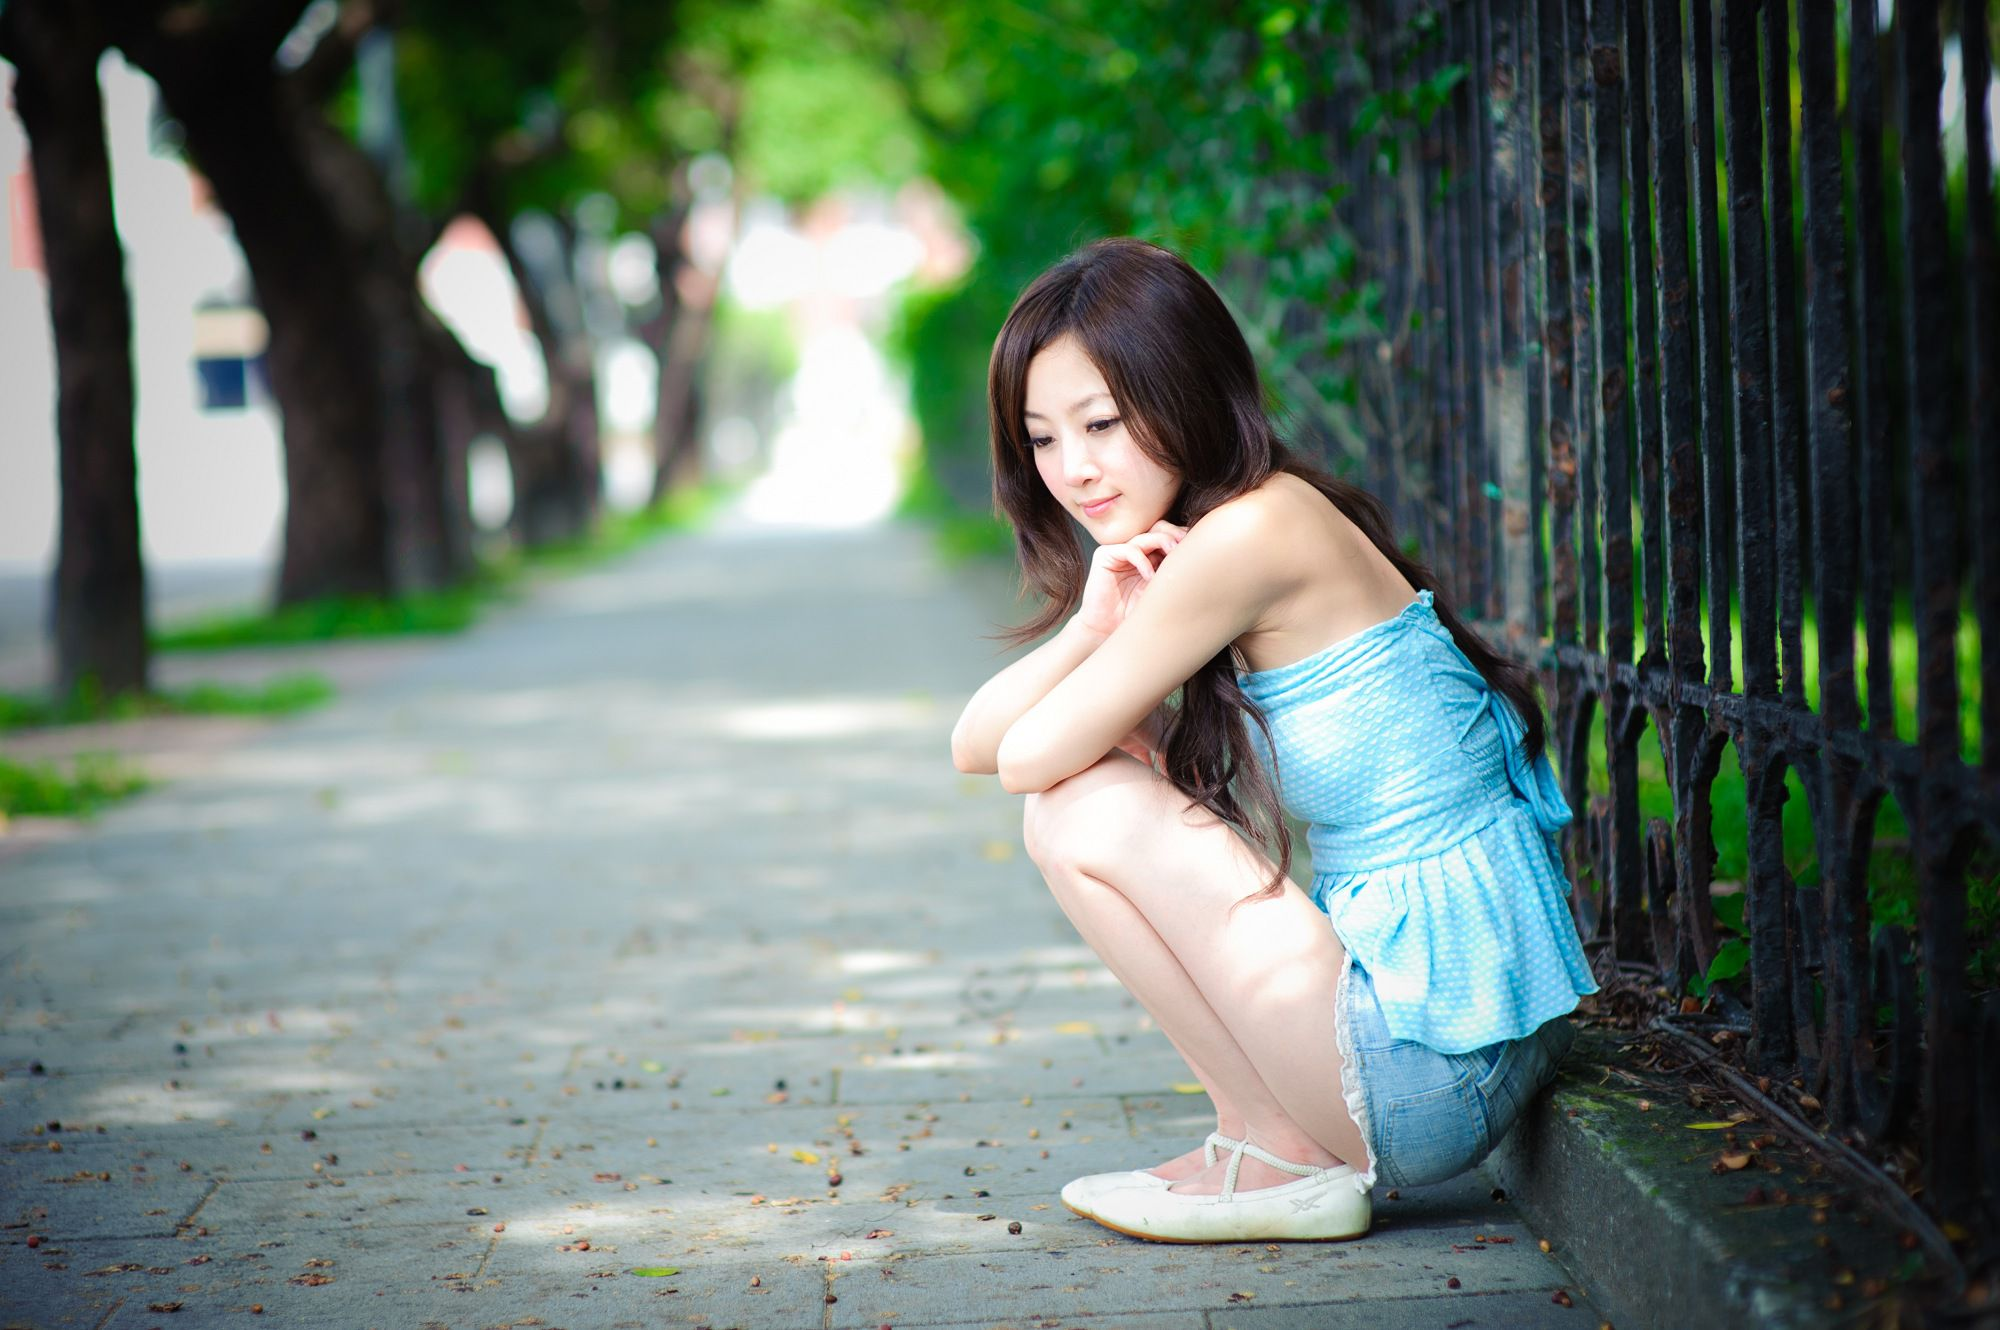 VOL.258 [台湾正妹]清纯街拍妹子:张凯洁(张允霏,果子MM)高品质写真套图(50P)